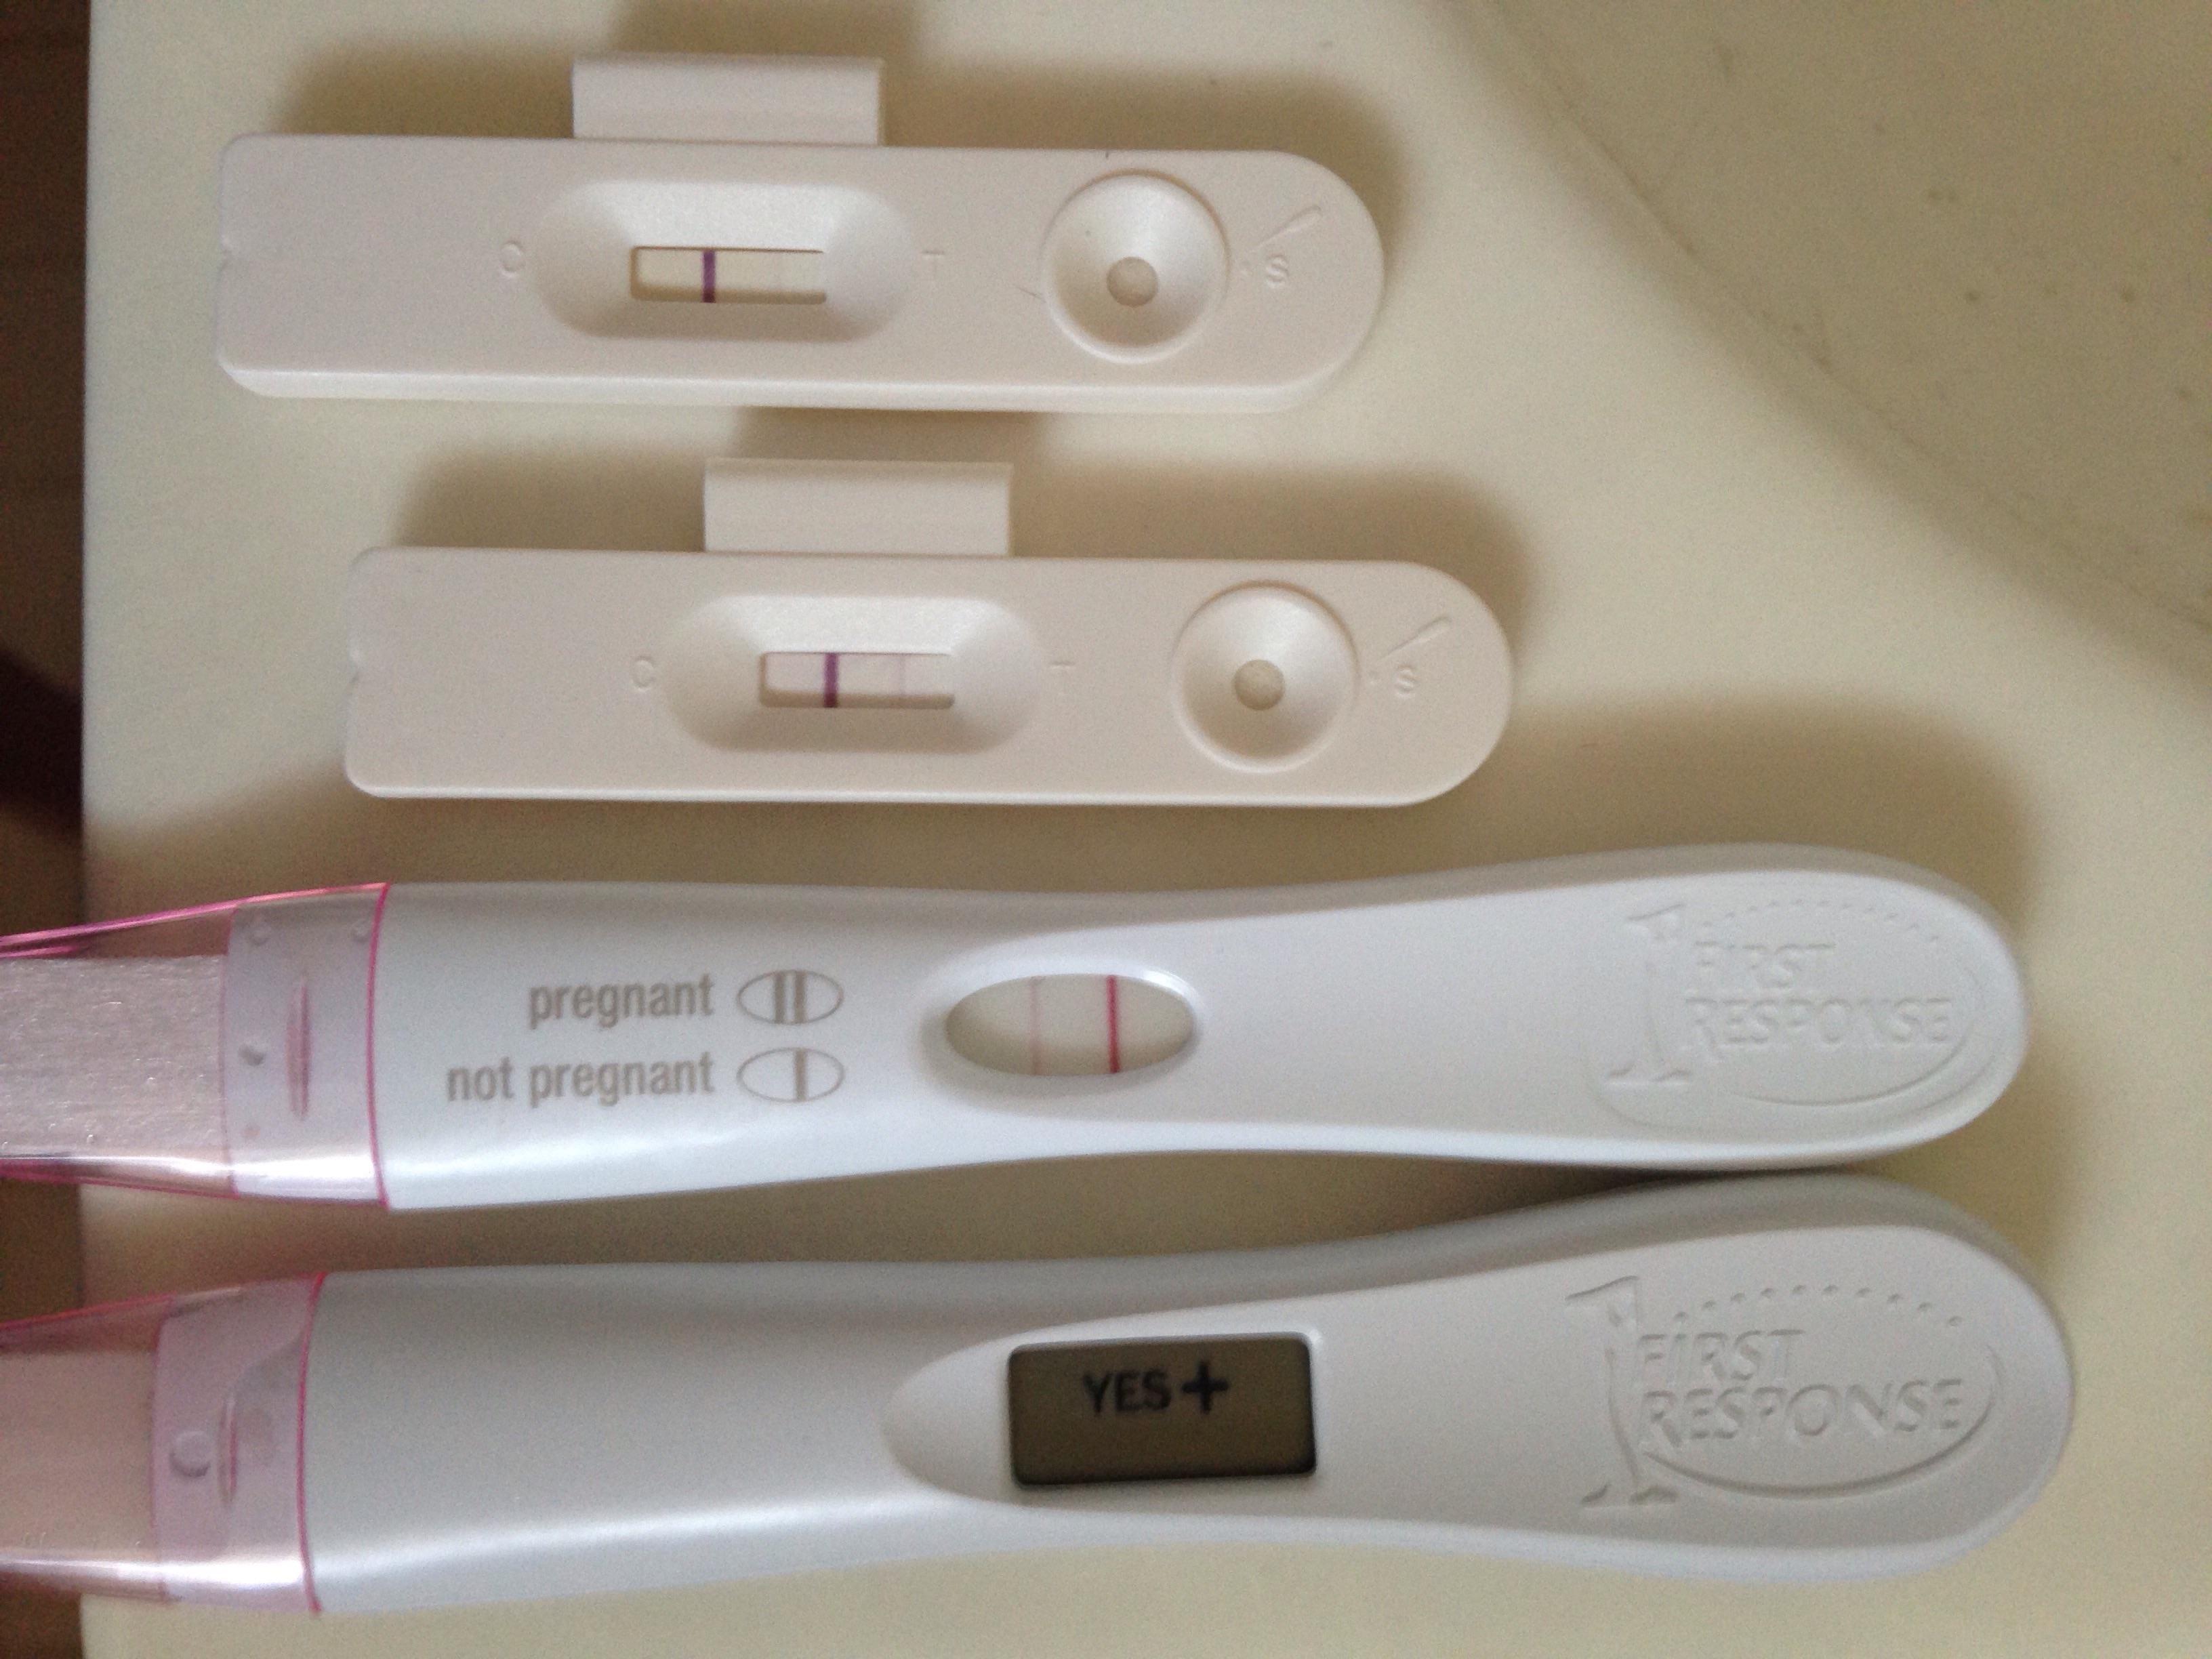 clear blue digital pregnancy test instructions